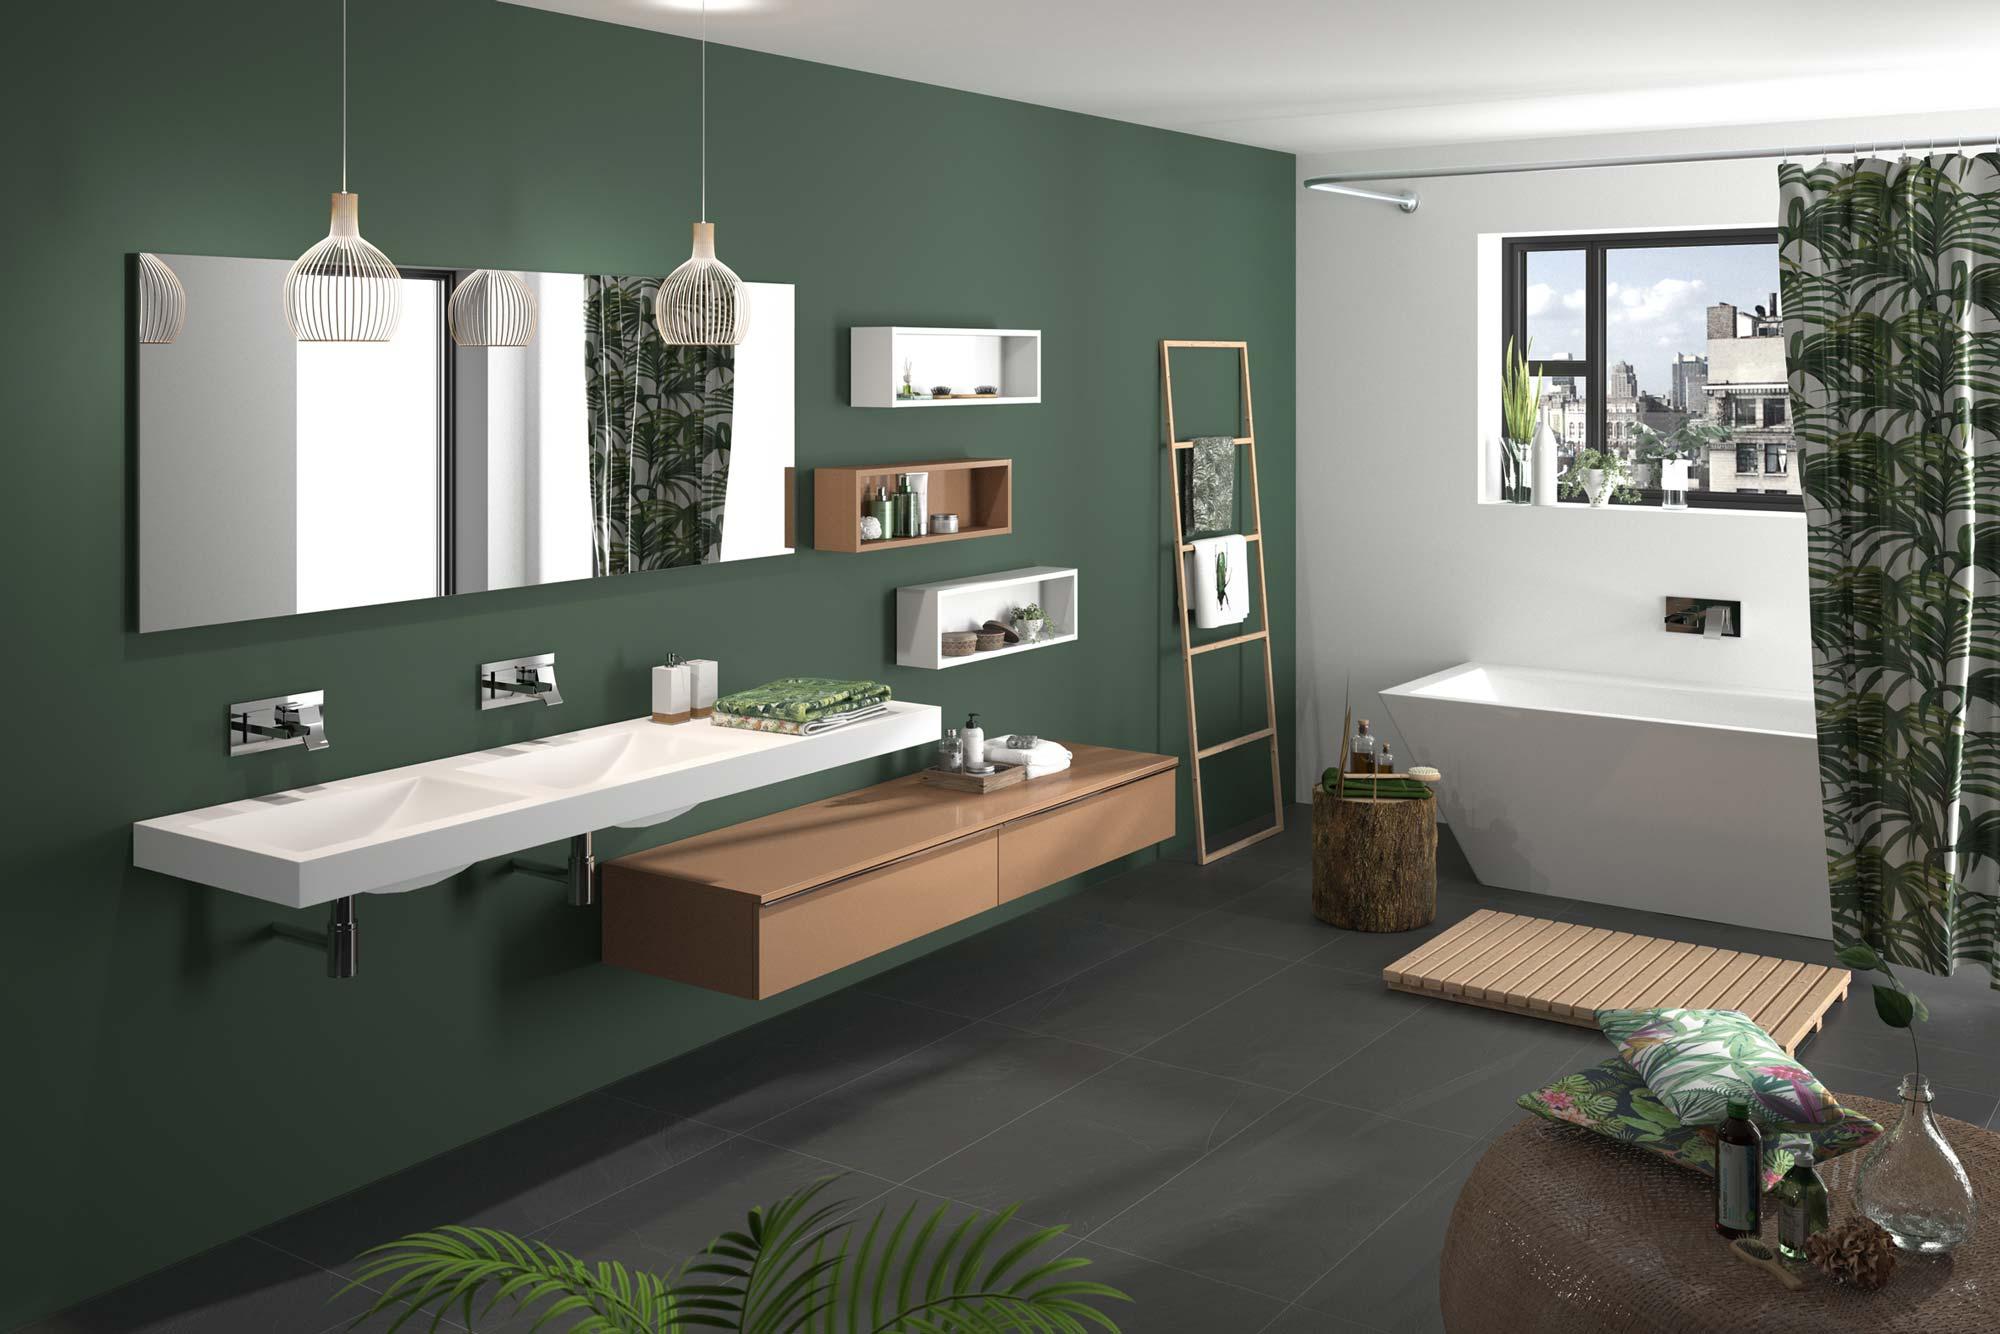 extenso meubles de salle de bains baignoires fabricant fran ais cedam. Black Bedroom Furniture Sets. Home Design Ideas